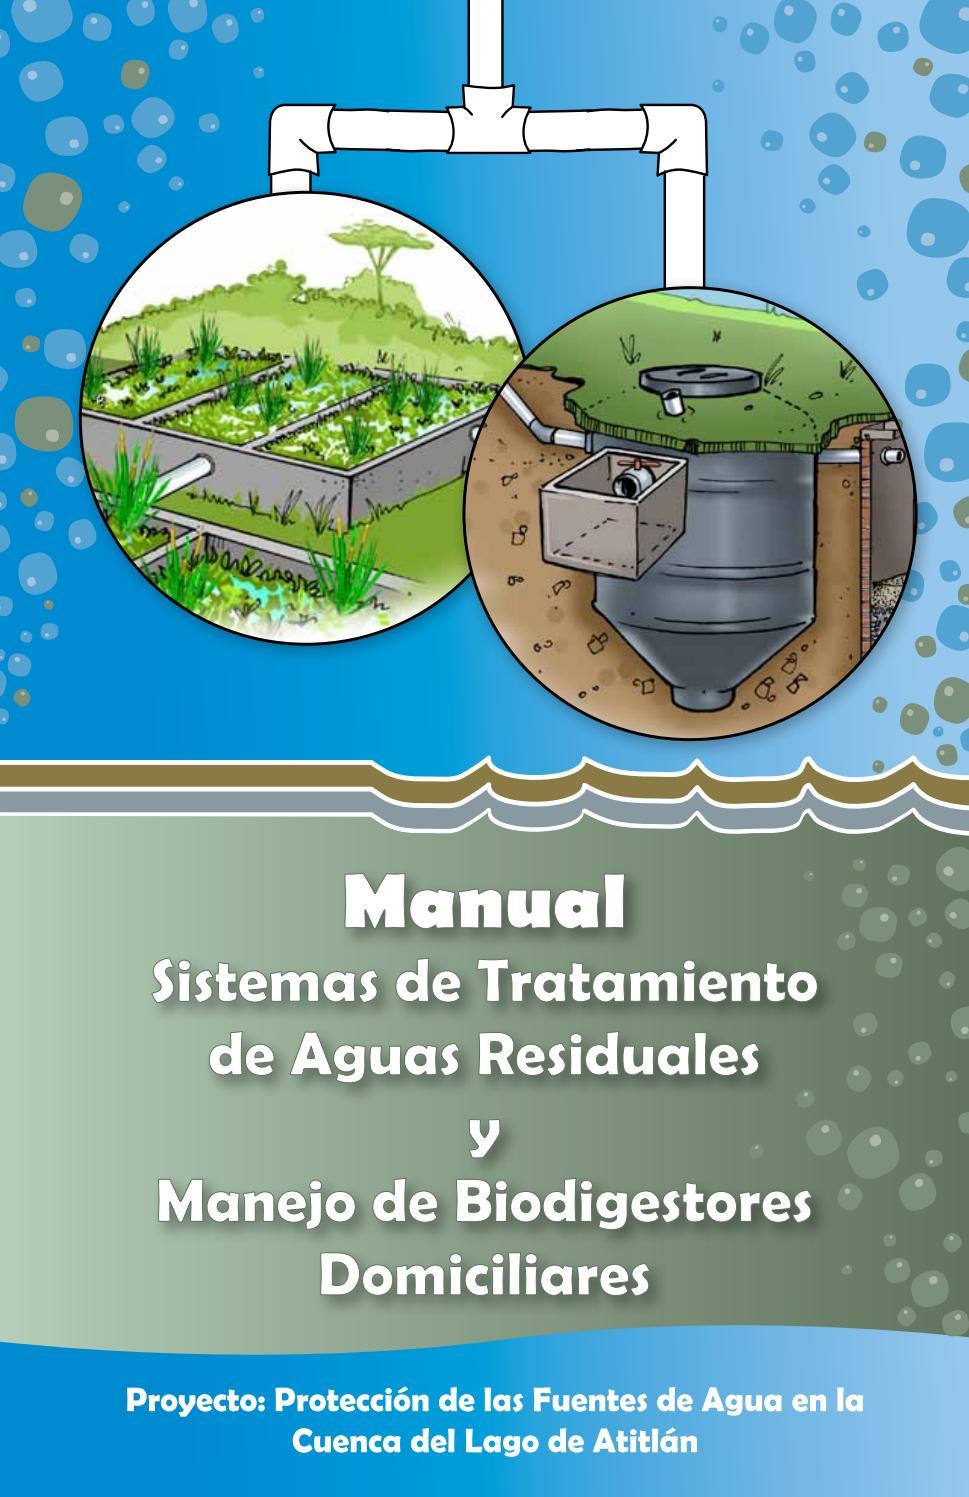 linehan manual tratamiento pdf